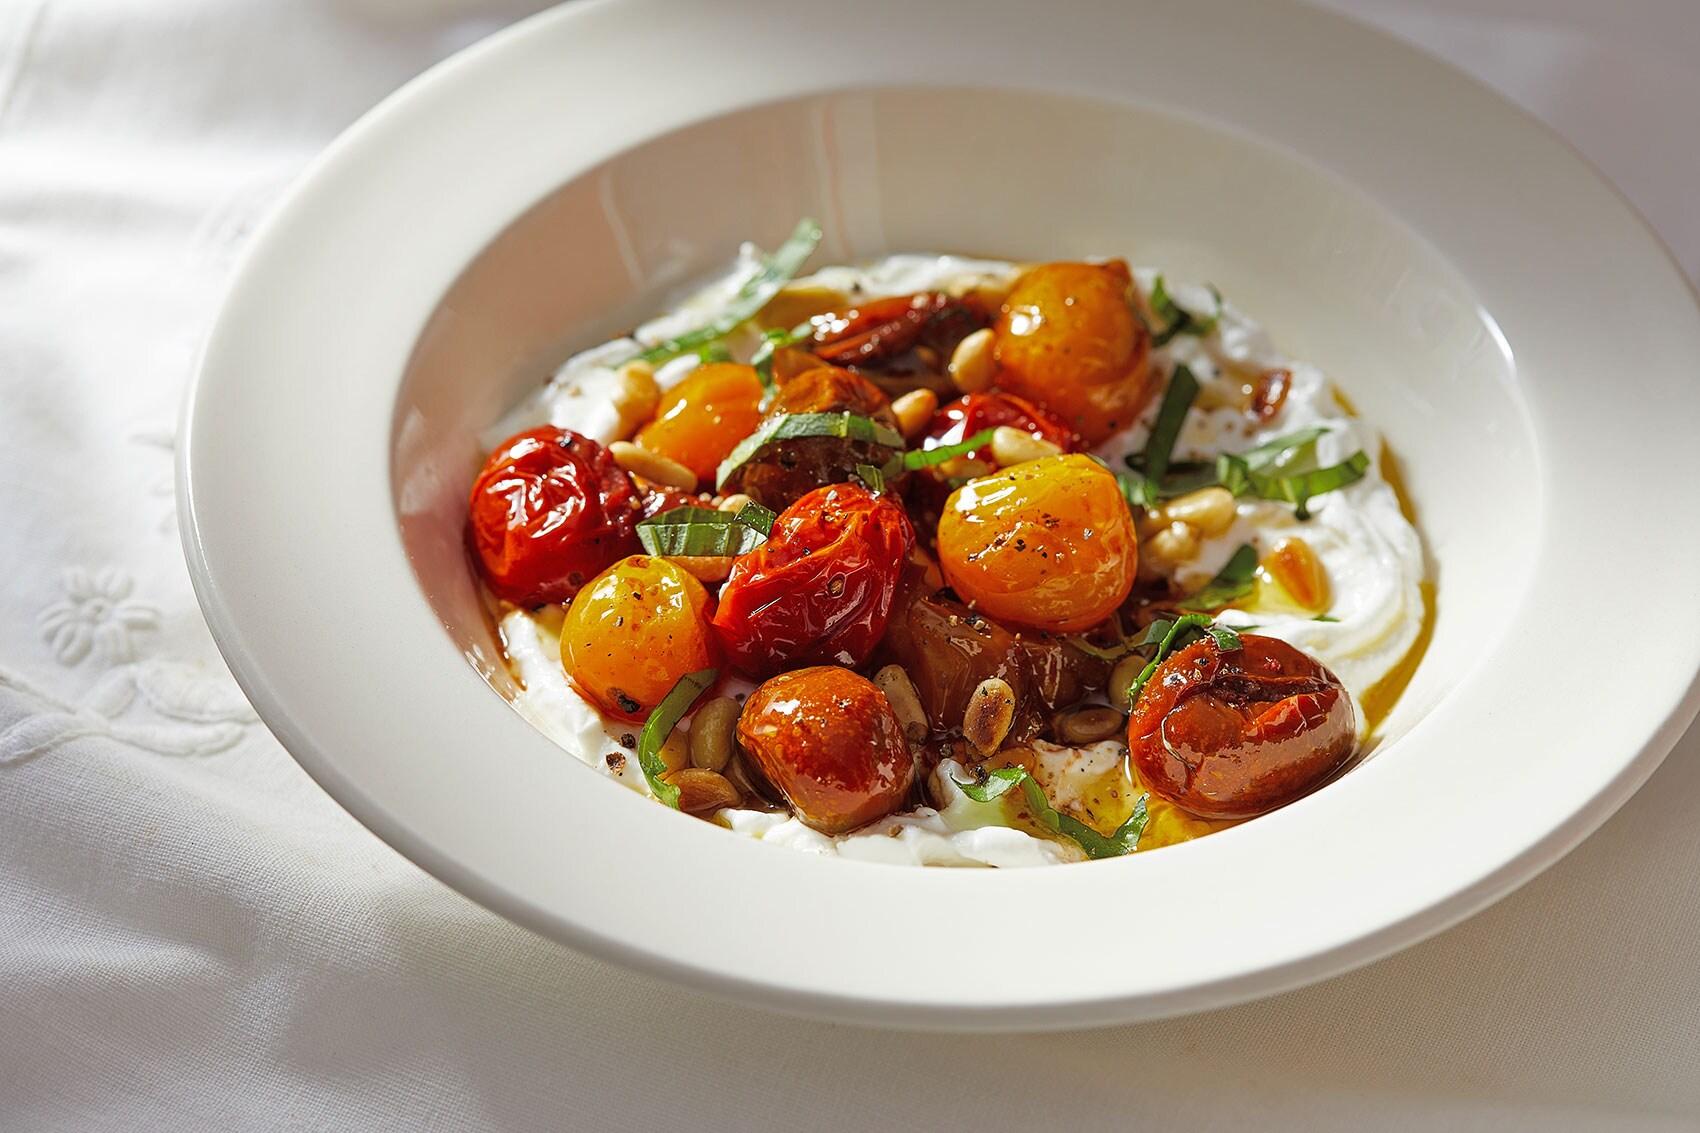 Savory Yogurt Bowl With Roasted Tomatoes photo